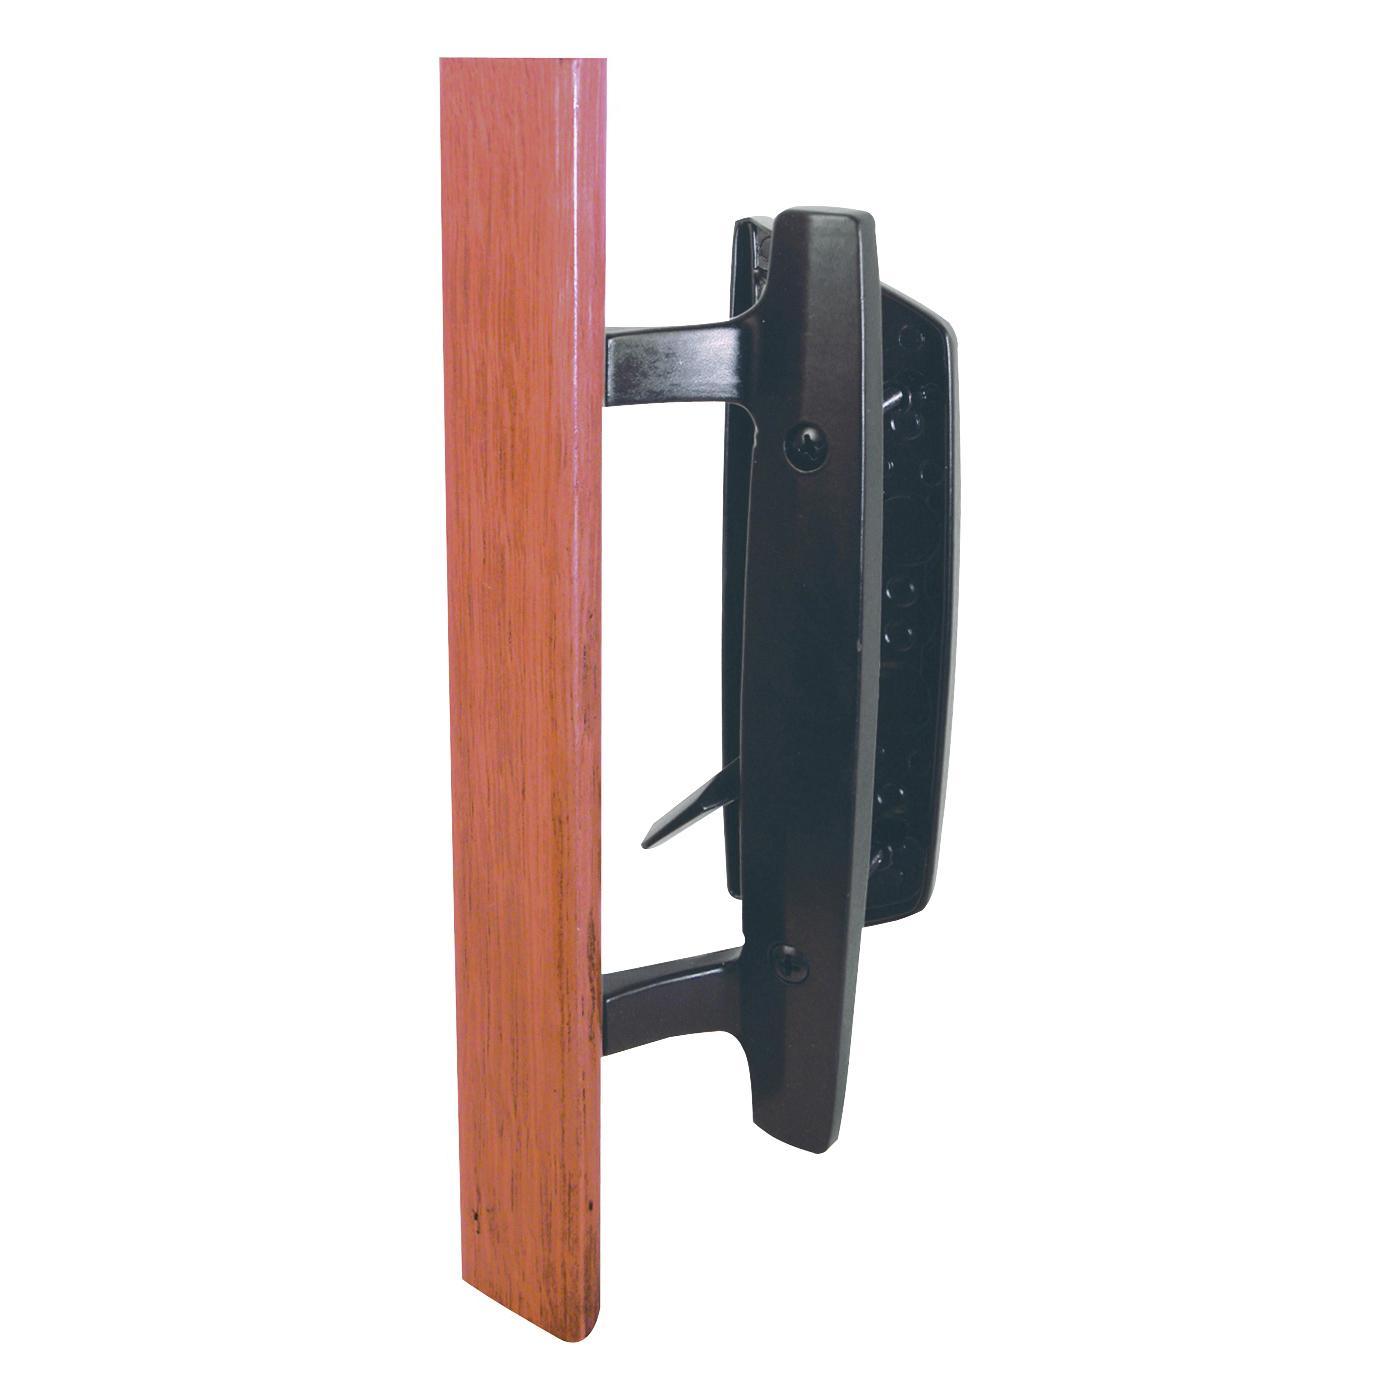 Picture of Prime-Line C 1131 Handle Set, Die-Cast/Wood, Wood, 1 to 1-1/2 in Thick Door